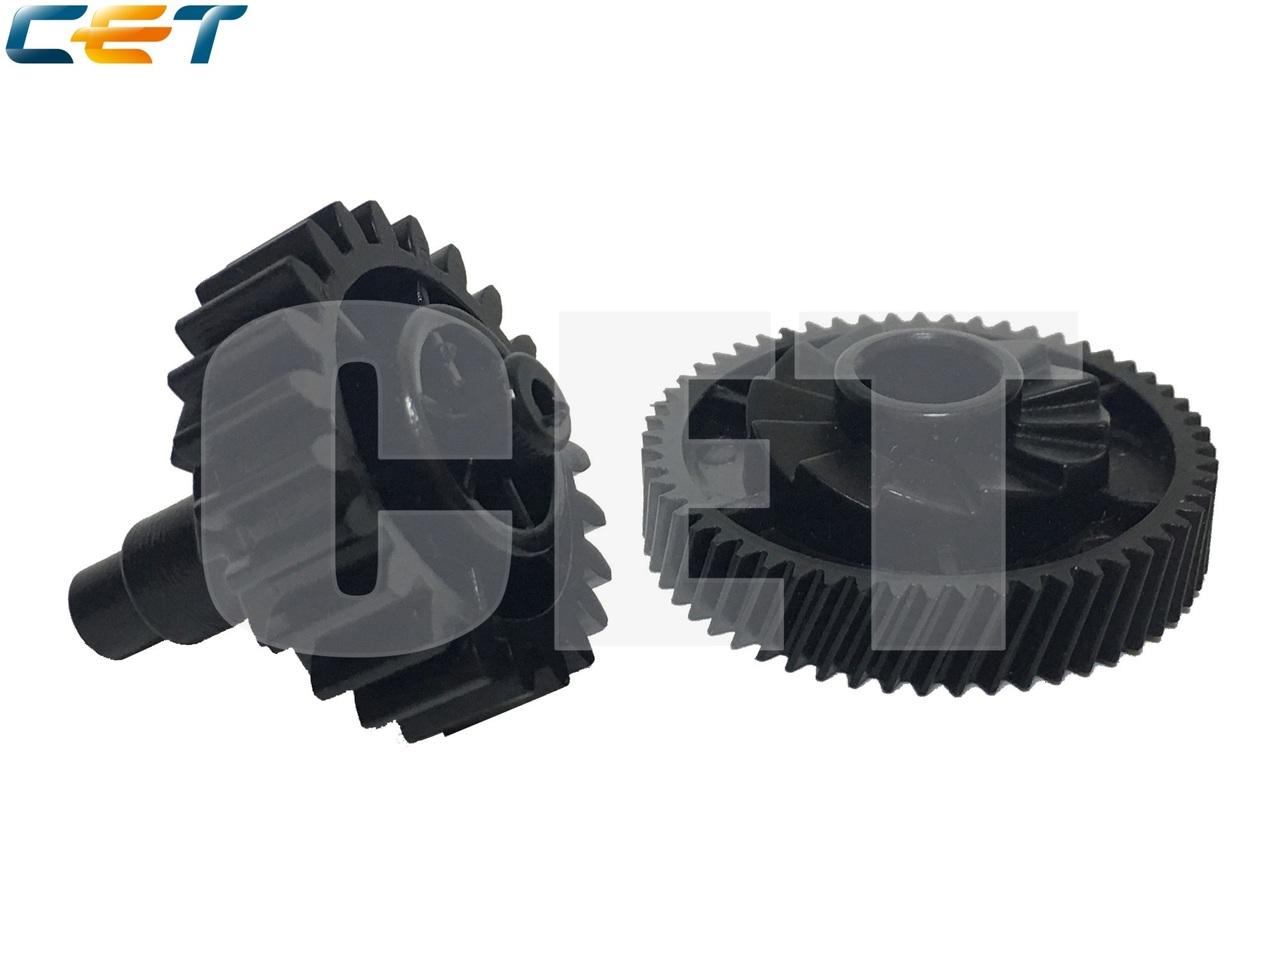 Шестерня 23Т/56Е RU5-0984-000CN для HP LaserJetP1005/P1102 (CET), DGP7495